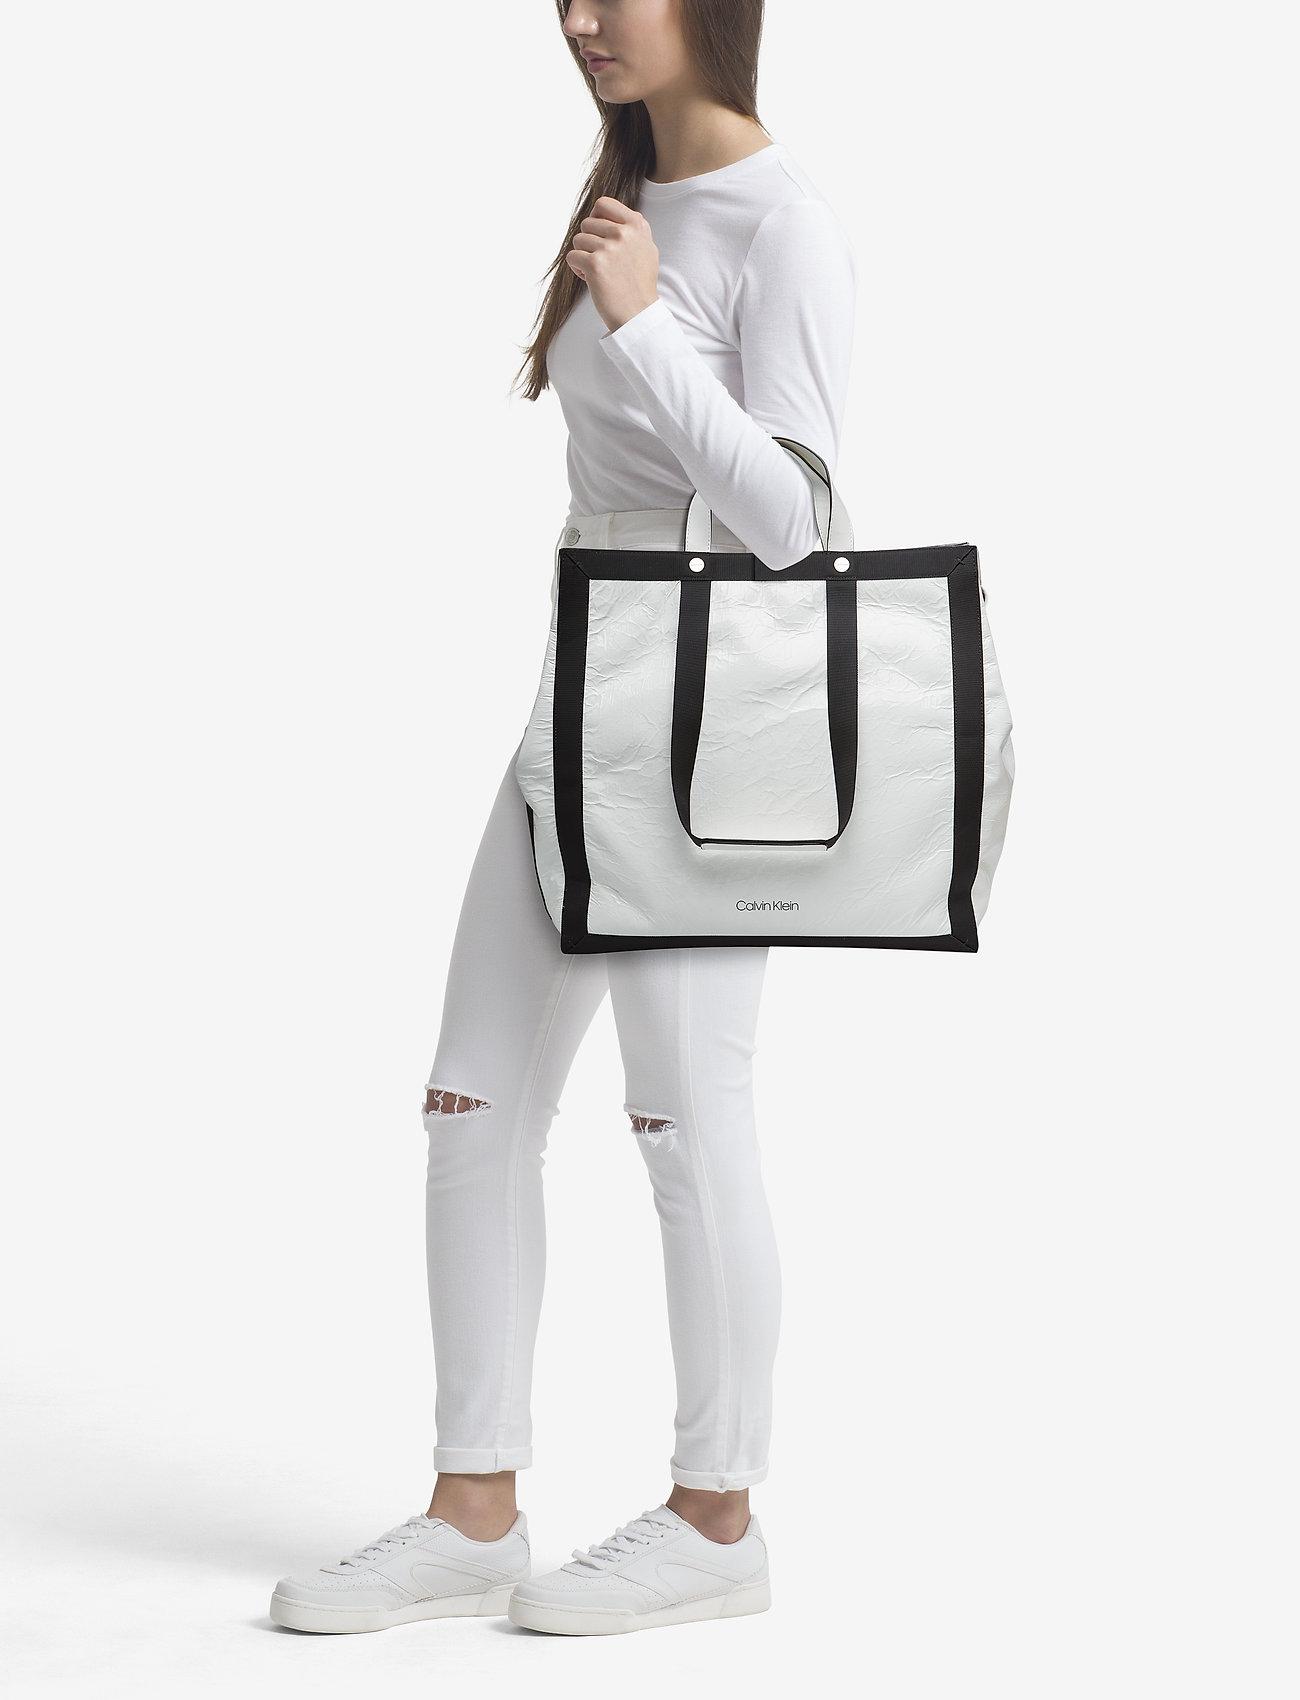 Calvin Klein OUTLINE MARKET SHOPP - BRIGHT WHITE